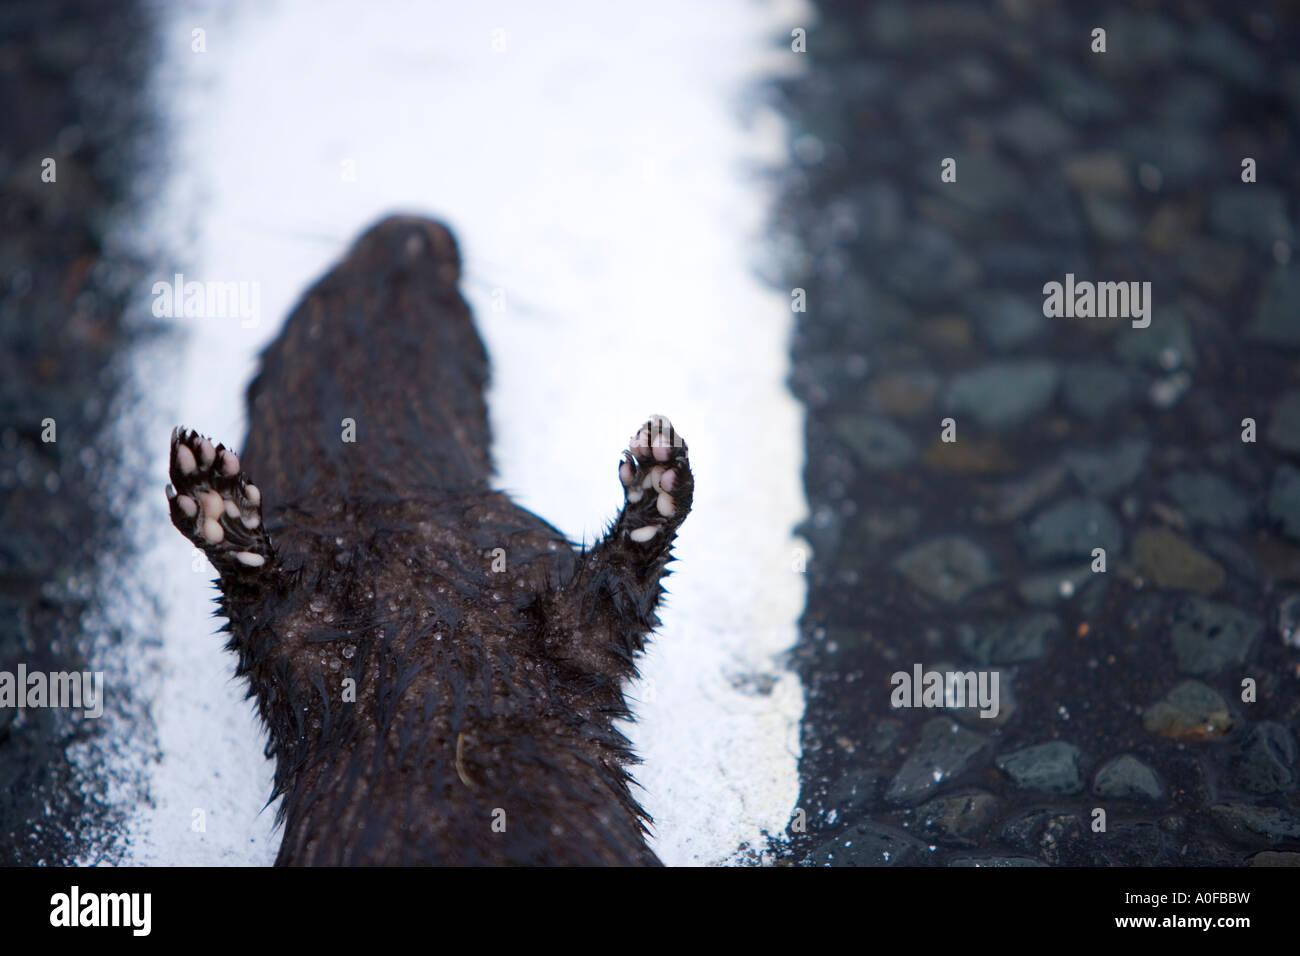 alamyprorank Introduced invasive American Mink dead on roadside as roadkill - Stock Image